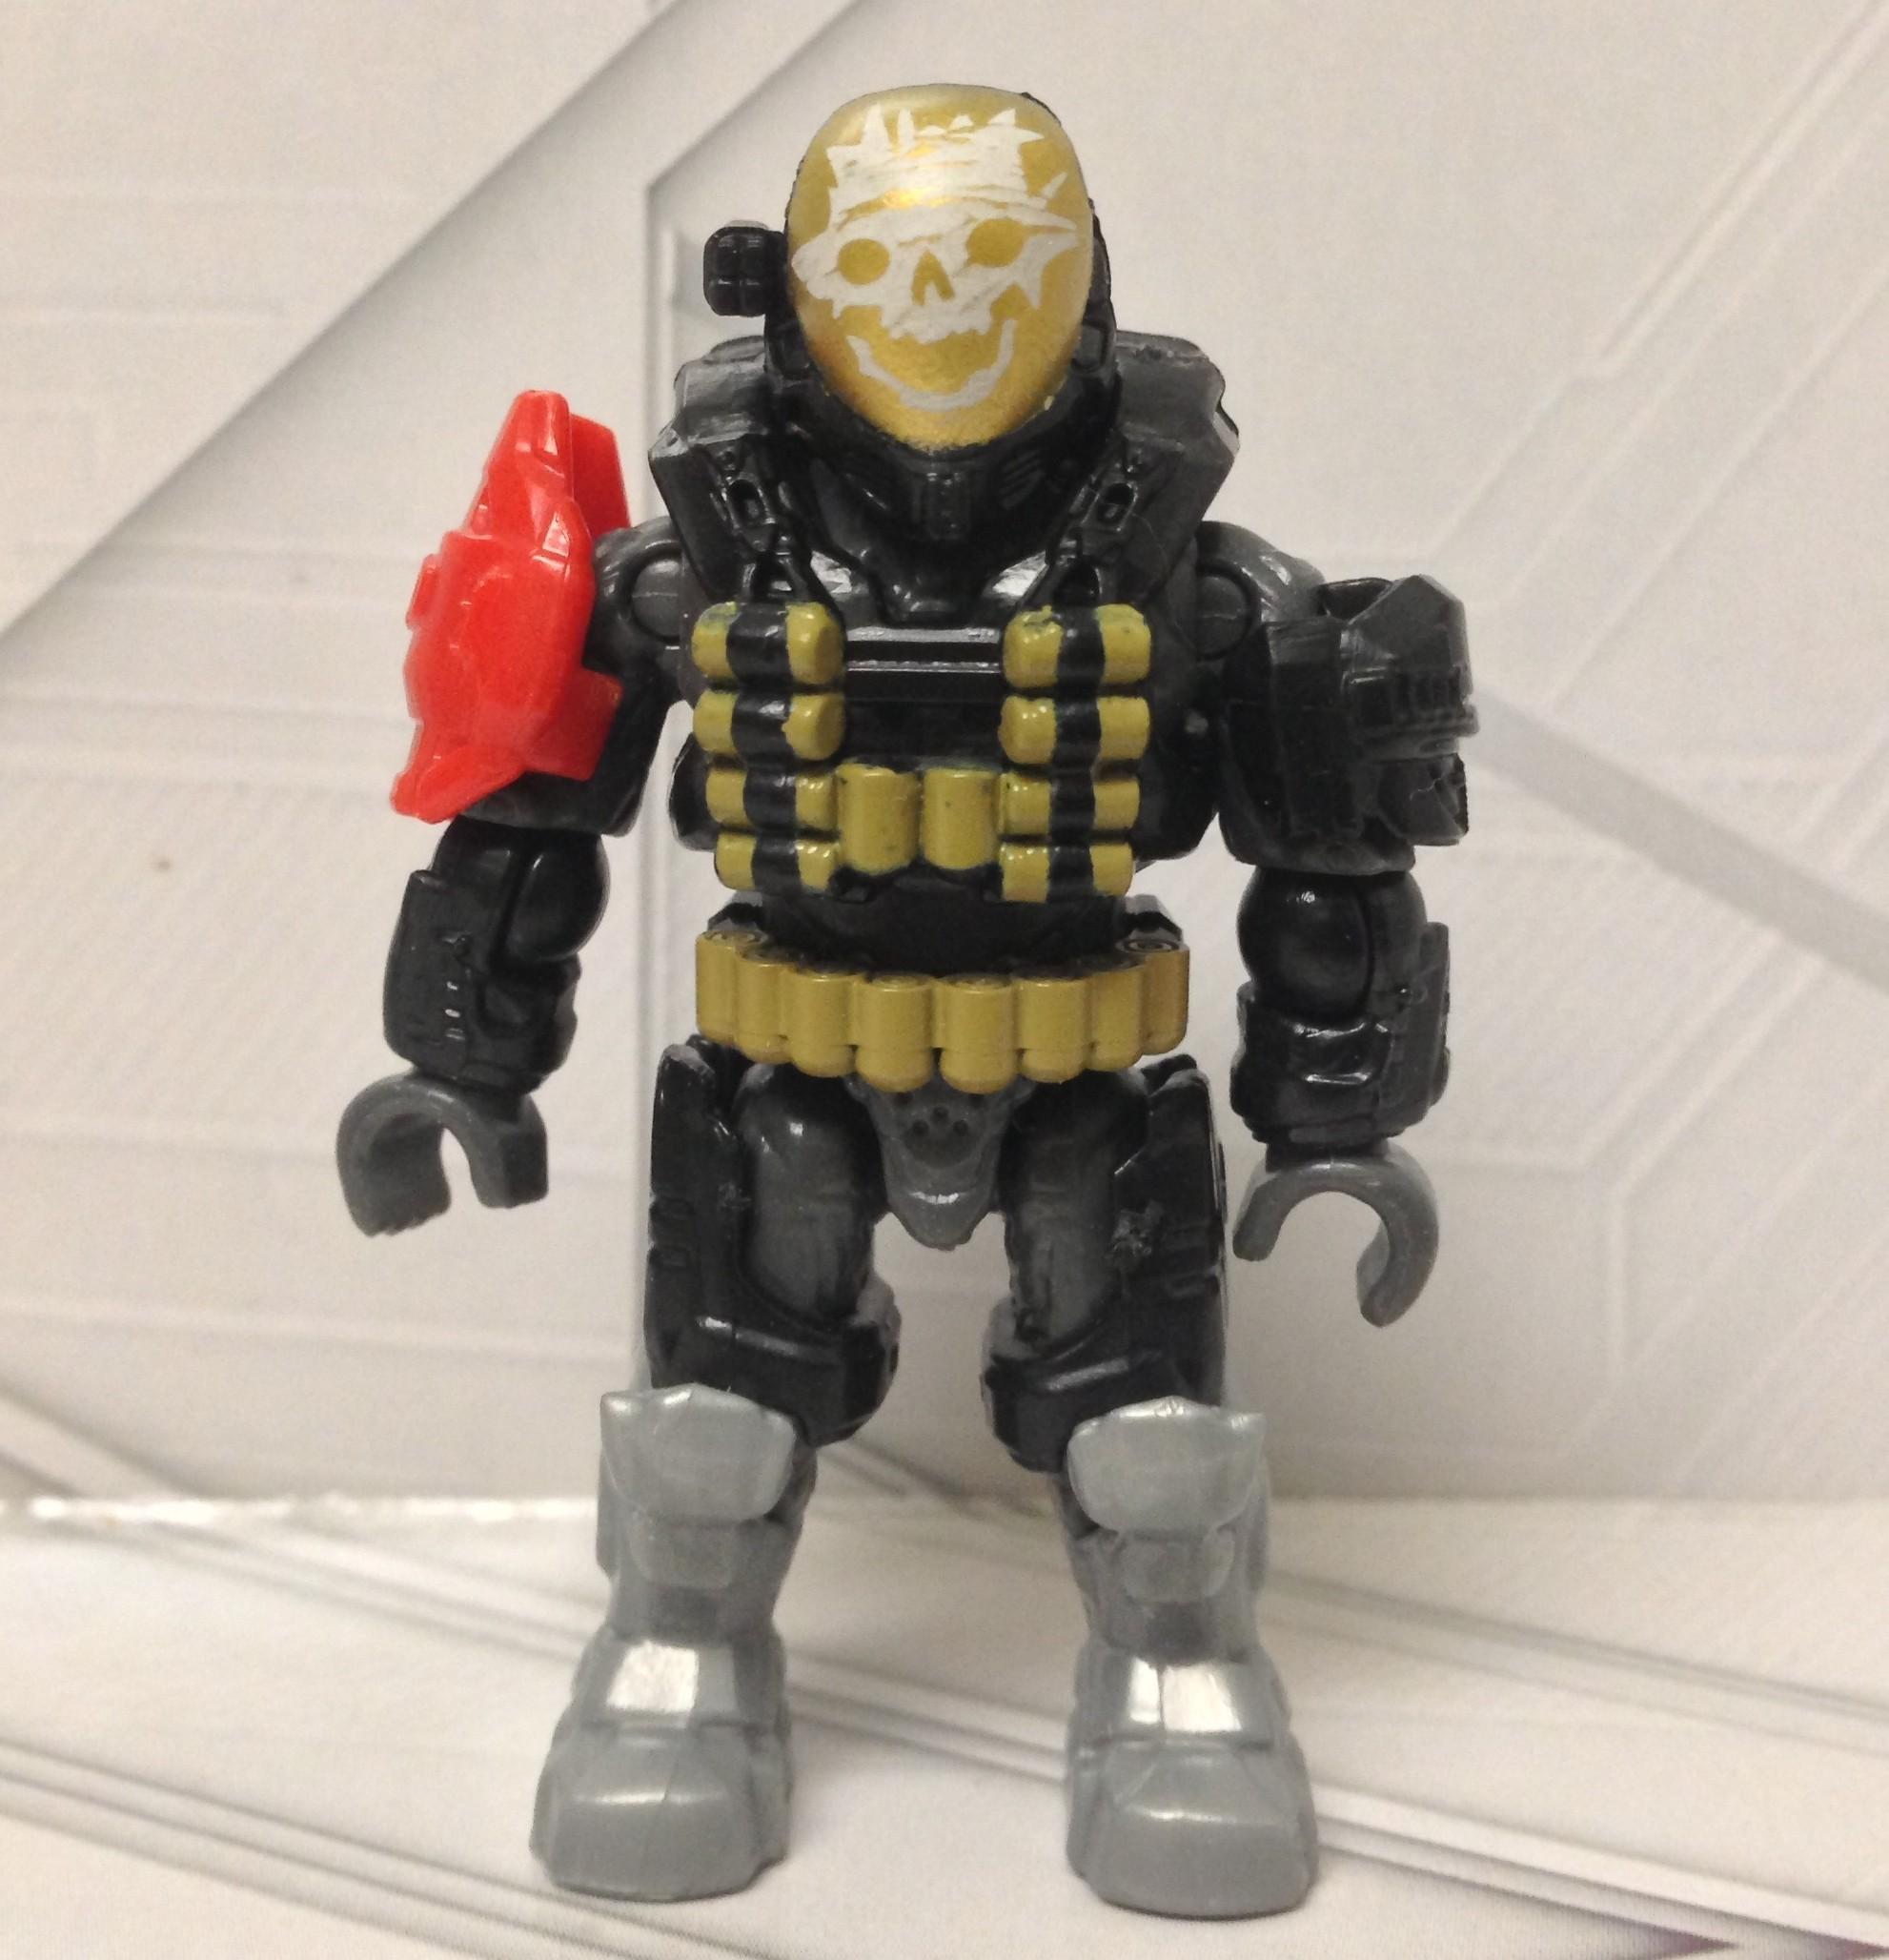 Halo Minimates Emile Emile Mega Bloks Halo Figure